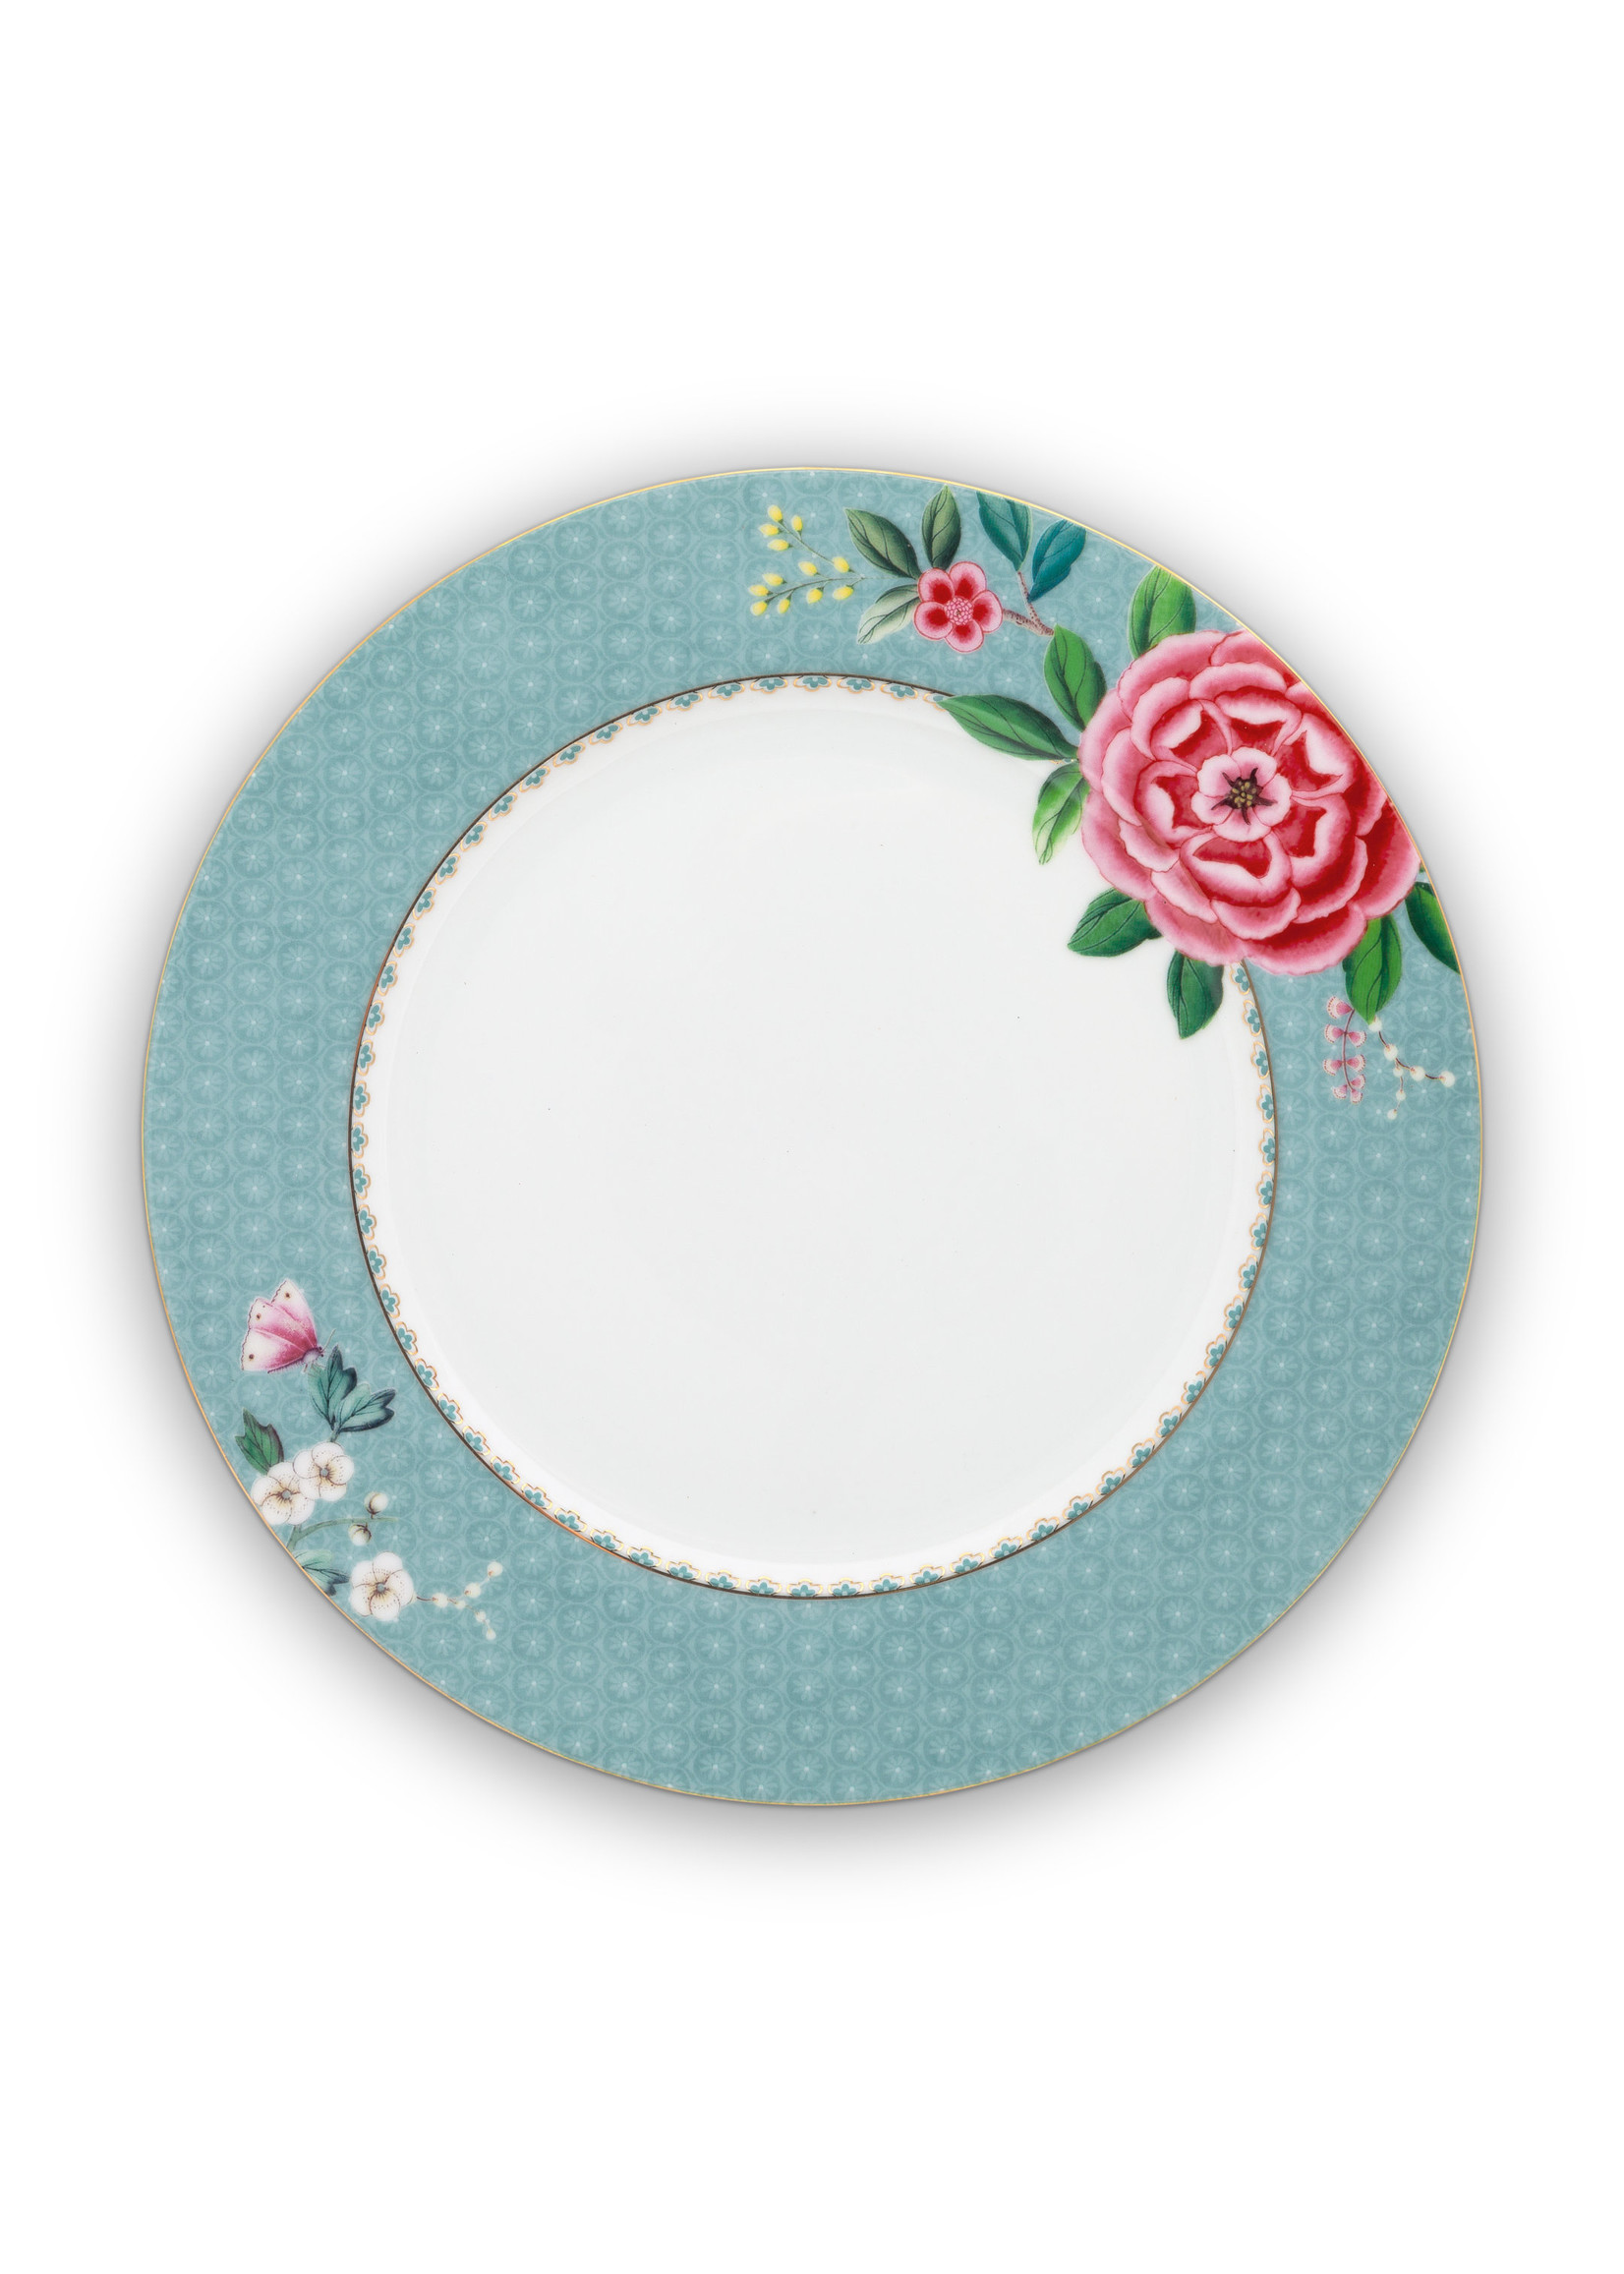 pip studio Plate blushing birds blue 26.5